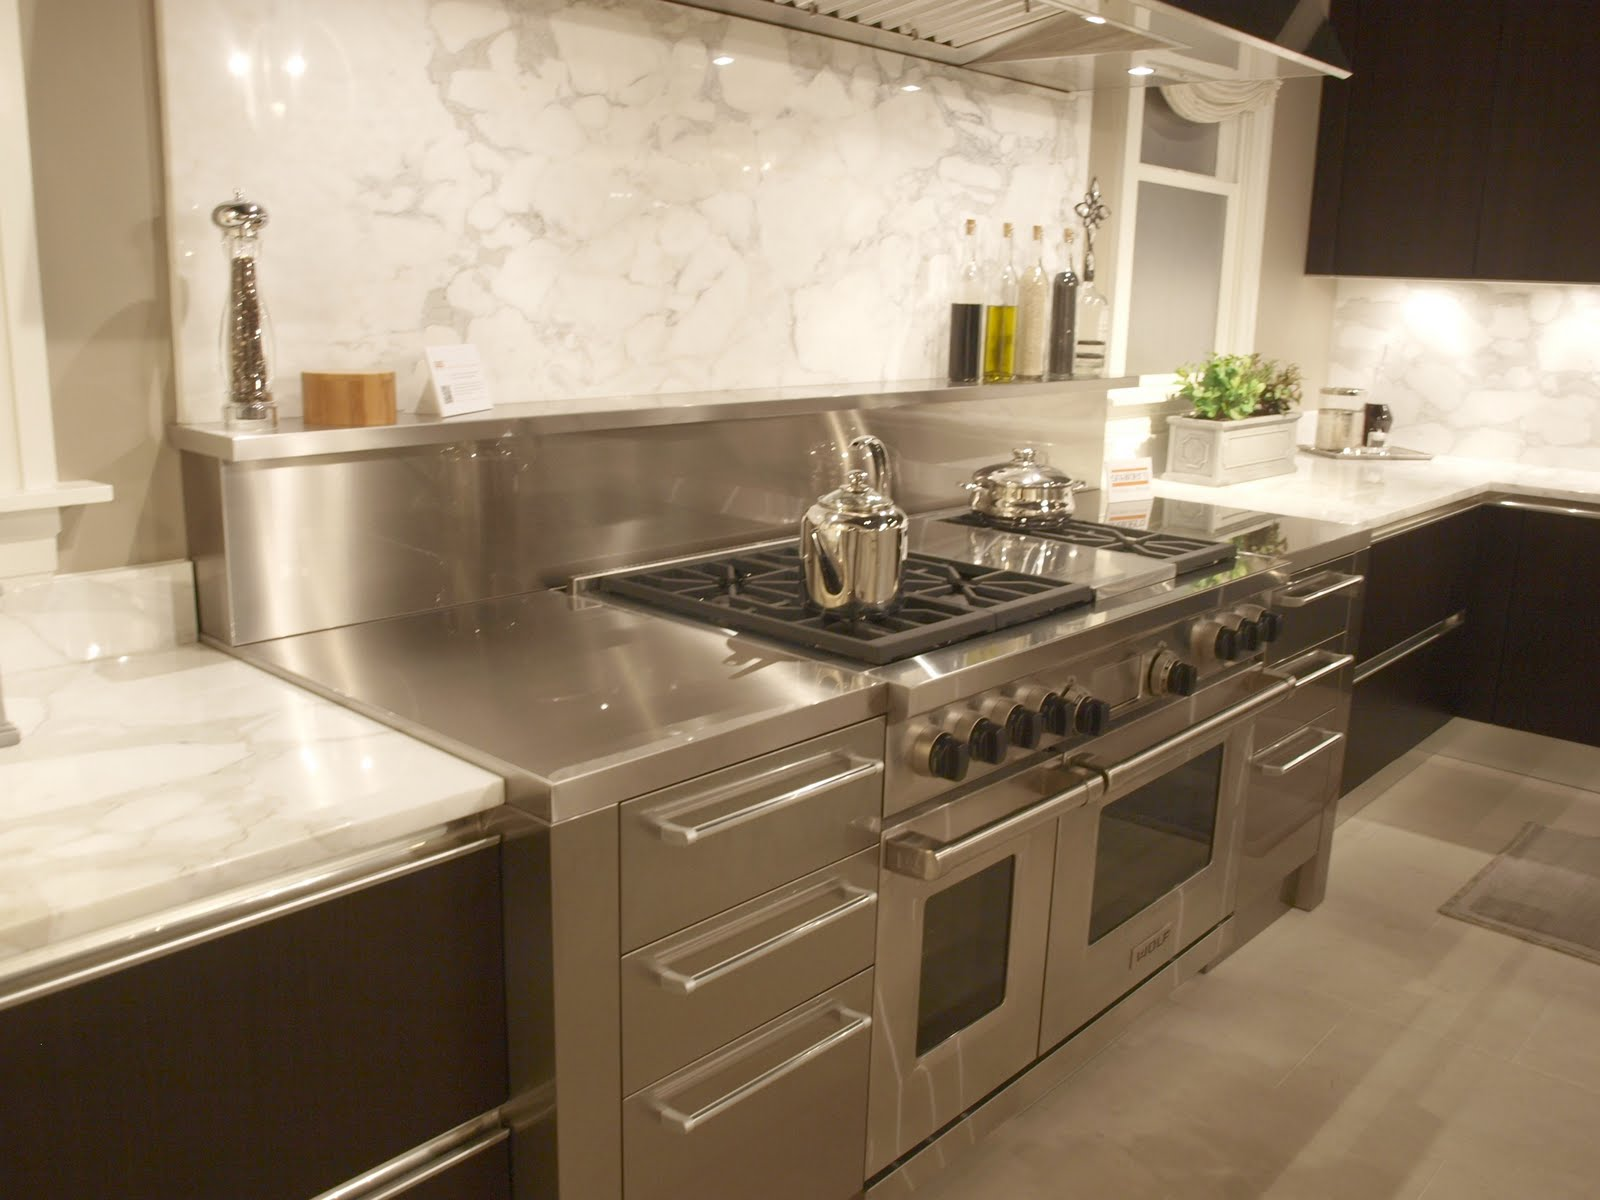 Home Decor Inspiration DREAM HOME Chicago kitchen by snaidero